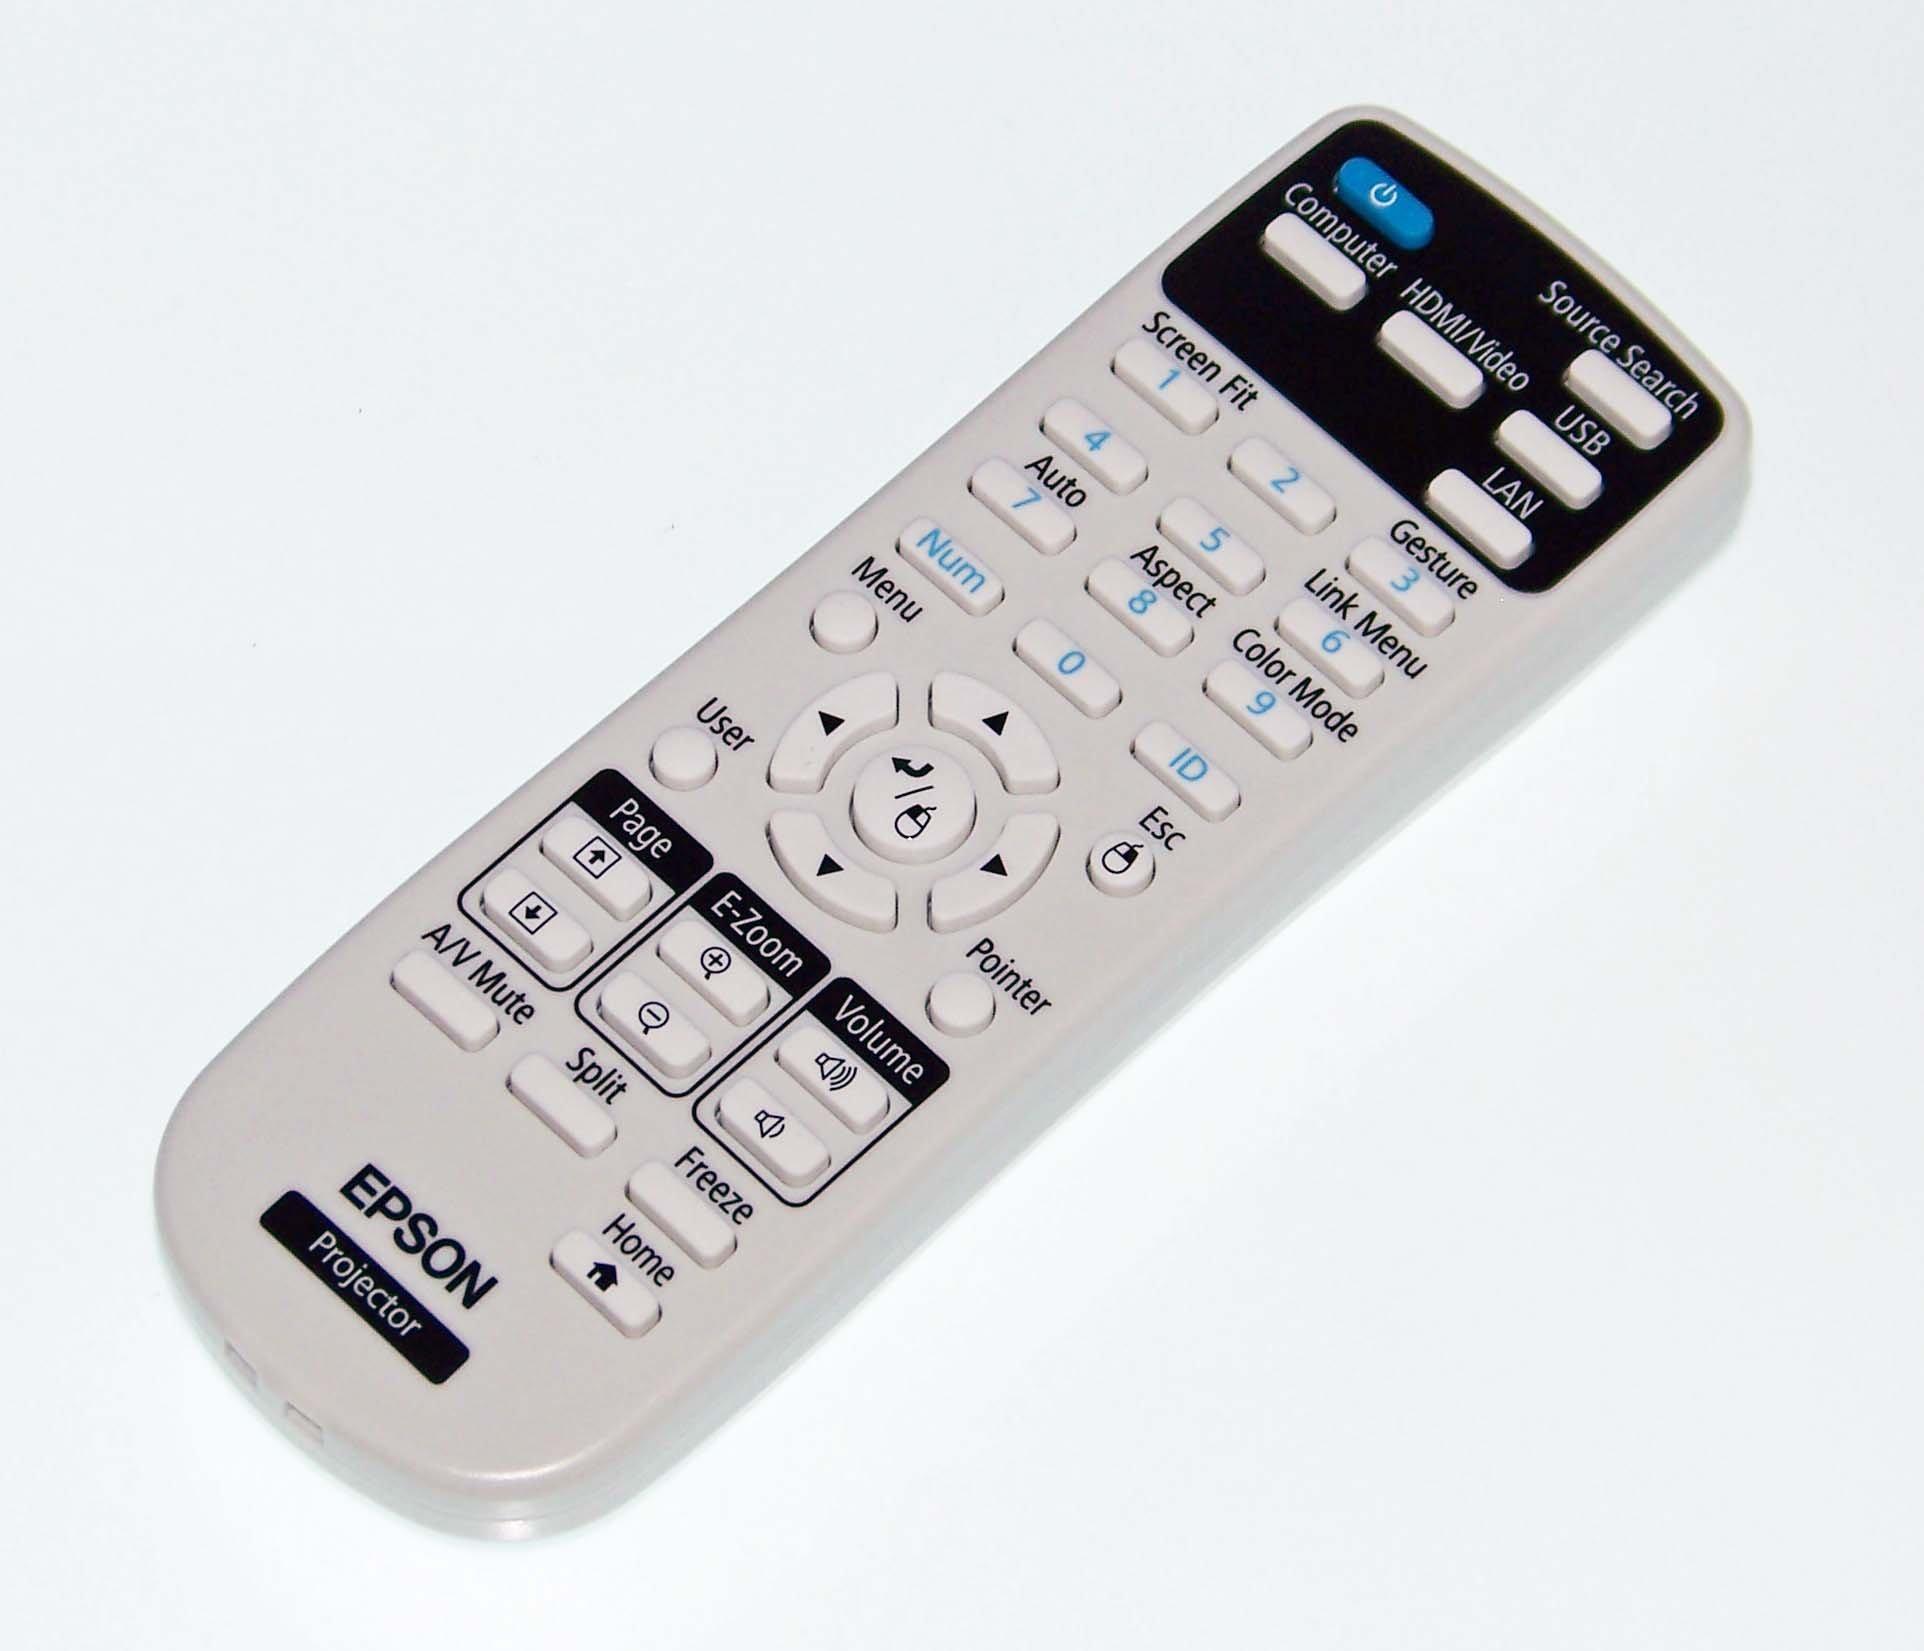 OEM Epson Remote Control: PowerLite 2265U, PowerLite Home Cinema 1450 by Epson